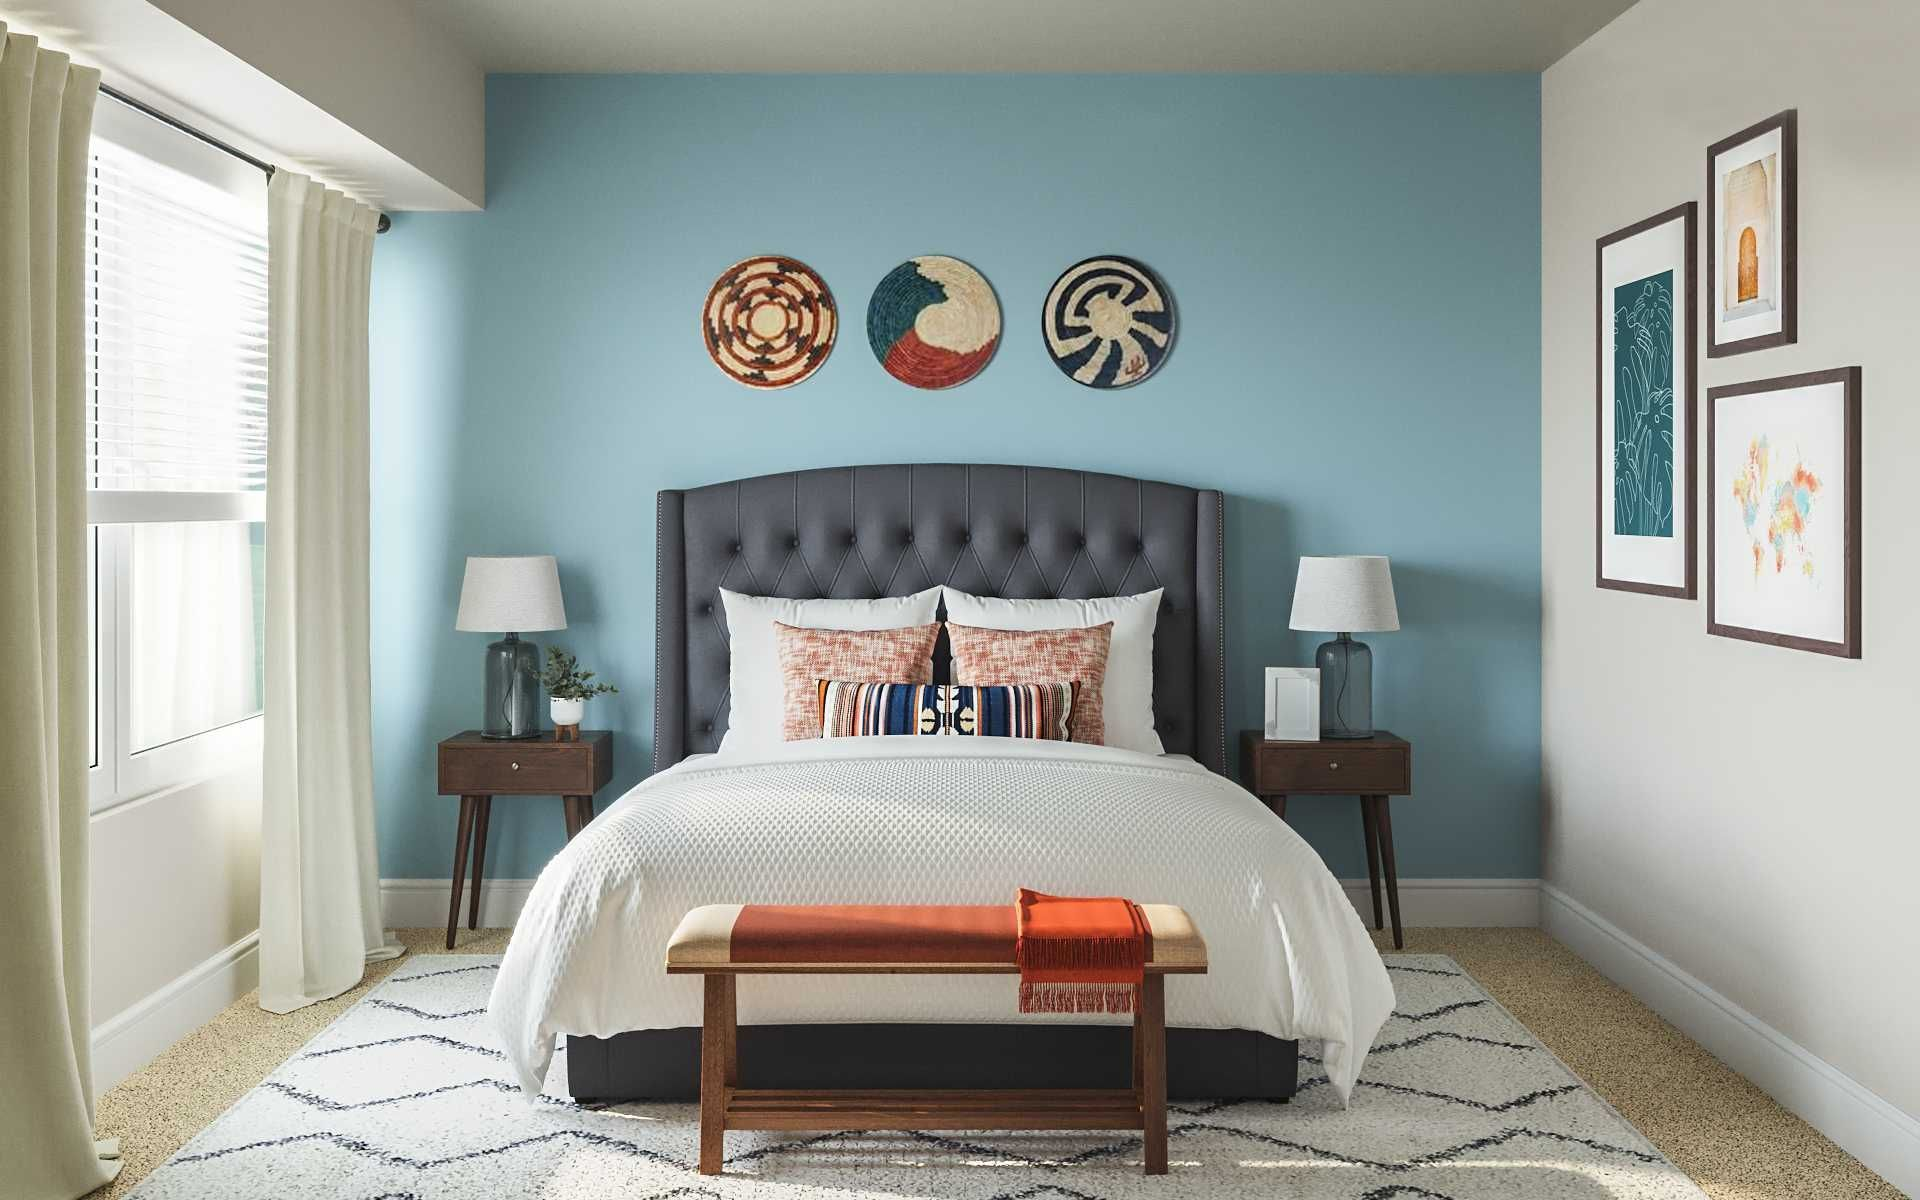 Bohemian Rustic Bedroom Design By Havenly Interior Designer Fendy Bedroom Design Rustic Bedroom Design Interior Design